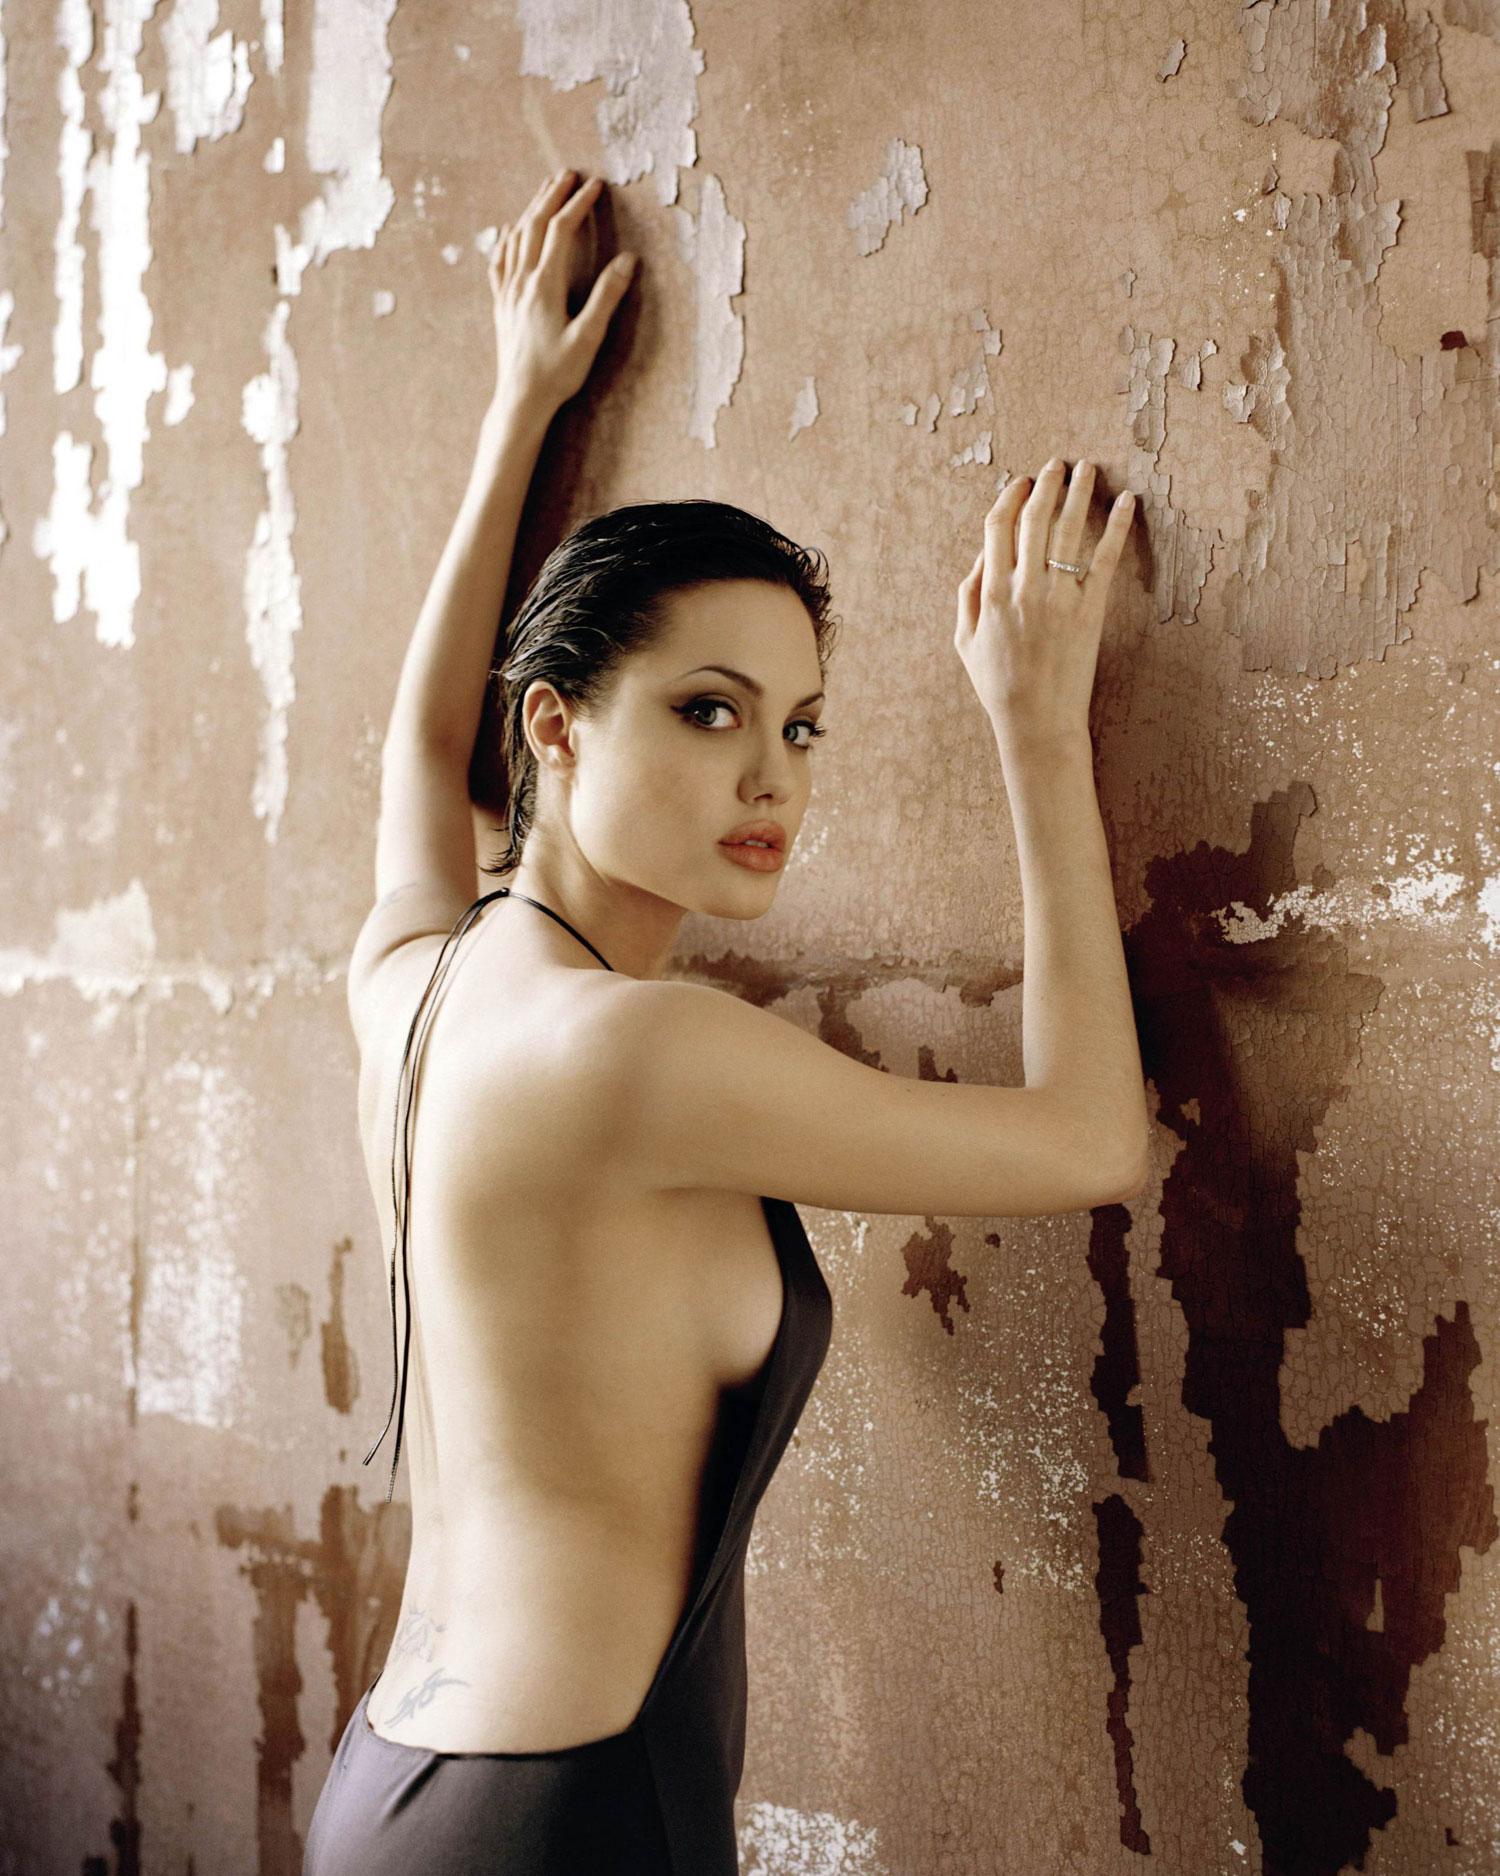 Angelina_Jolie-HOT_photos_56 | GotCeleb